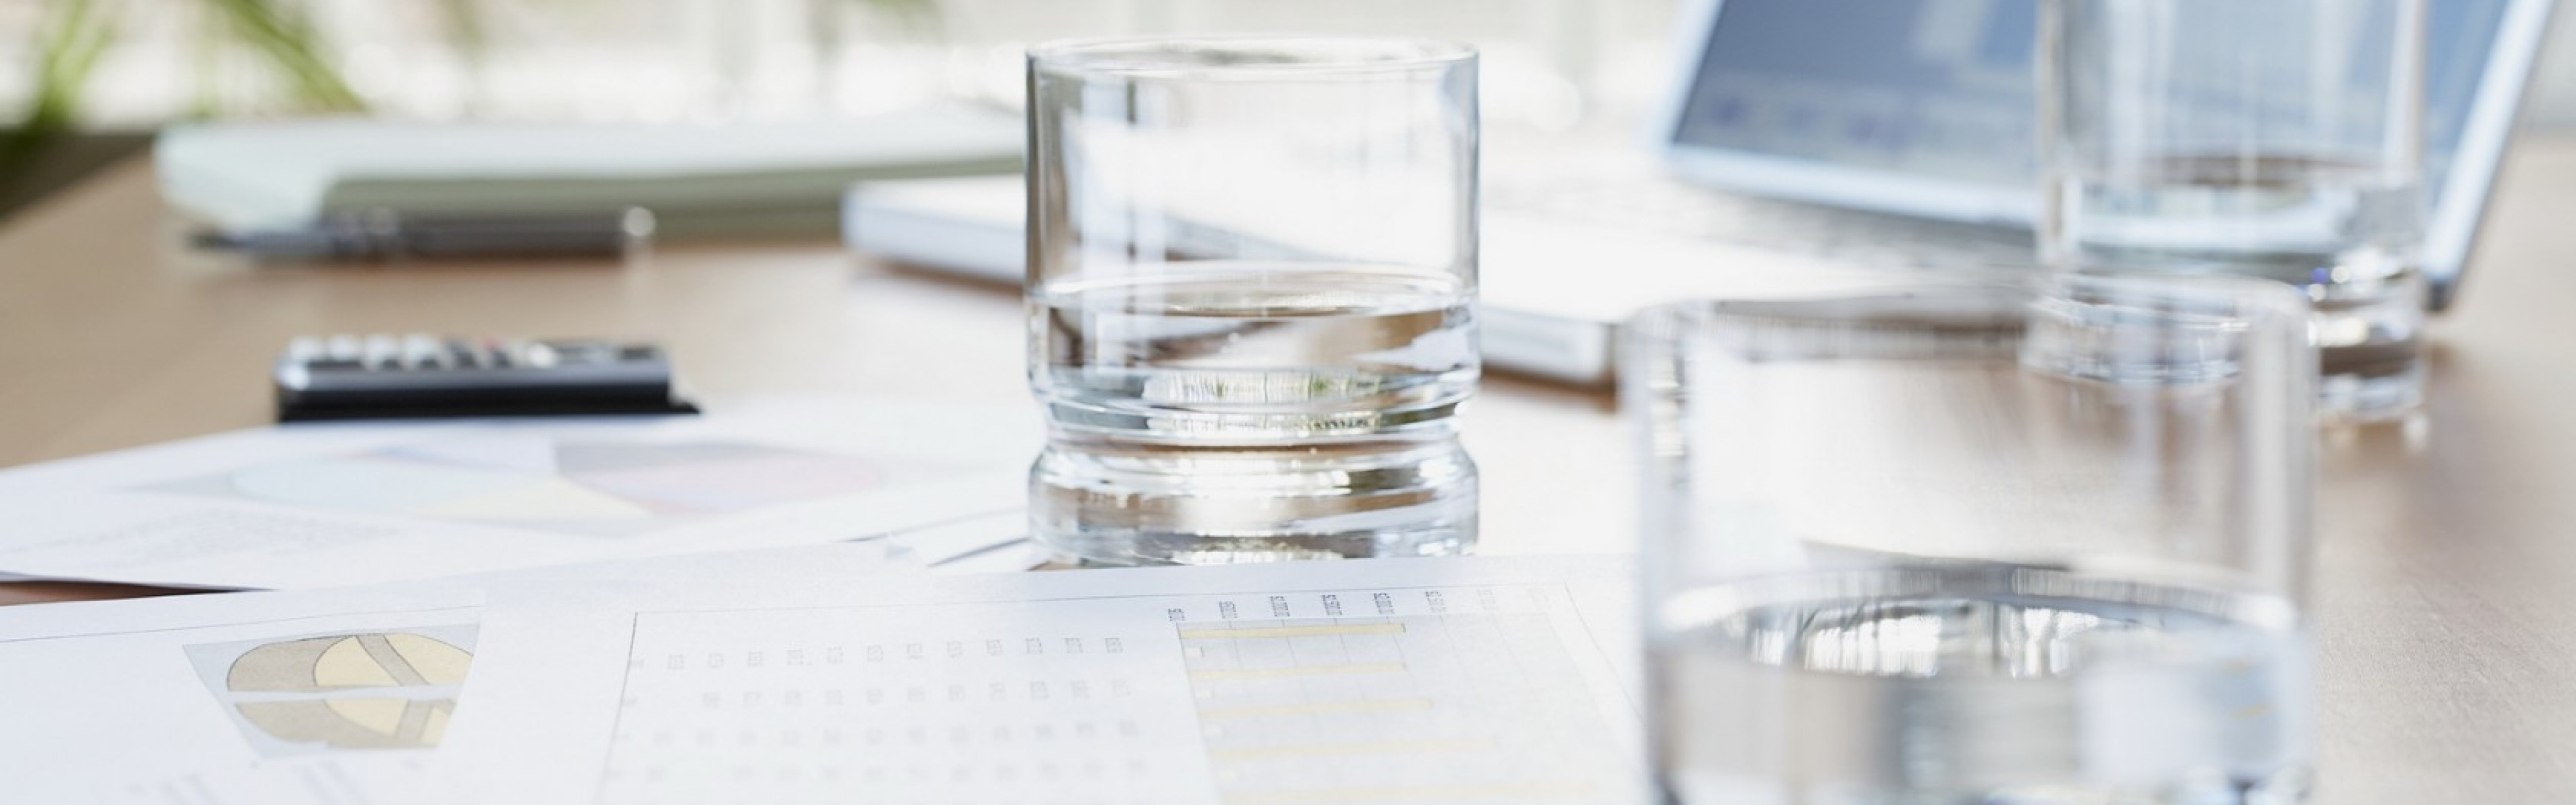 Wallpaper Laptop, Glass, Water, Documents, Business